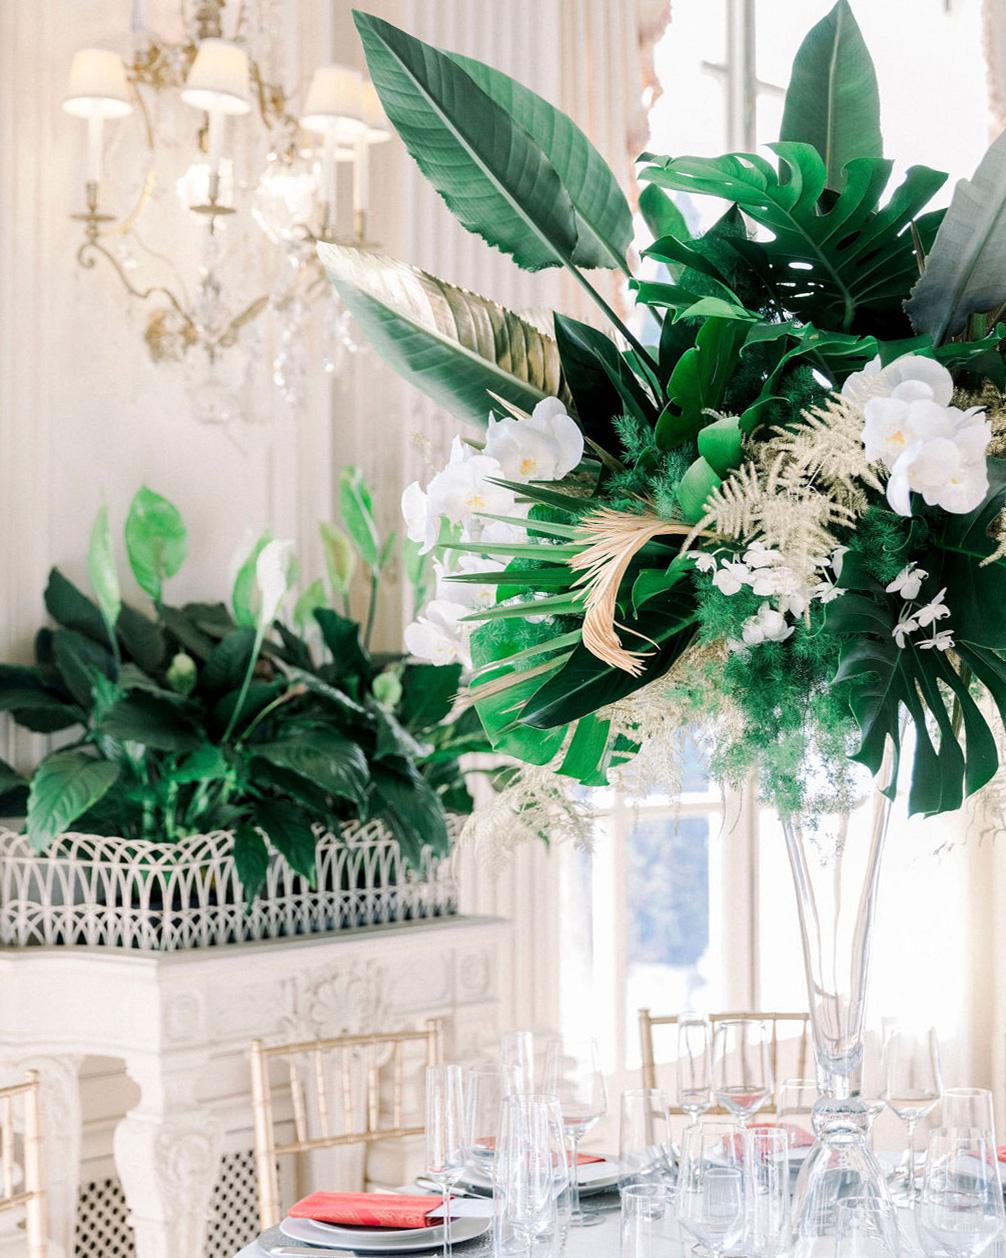 dalila elliot tropical green wedding centerpiece